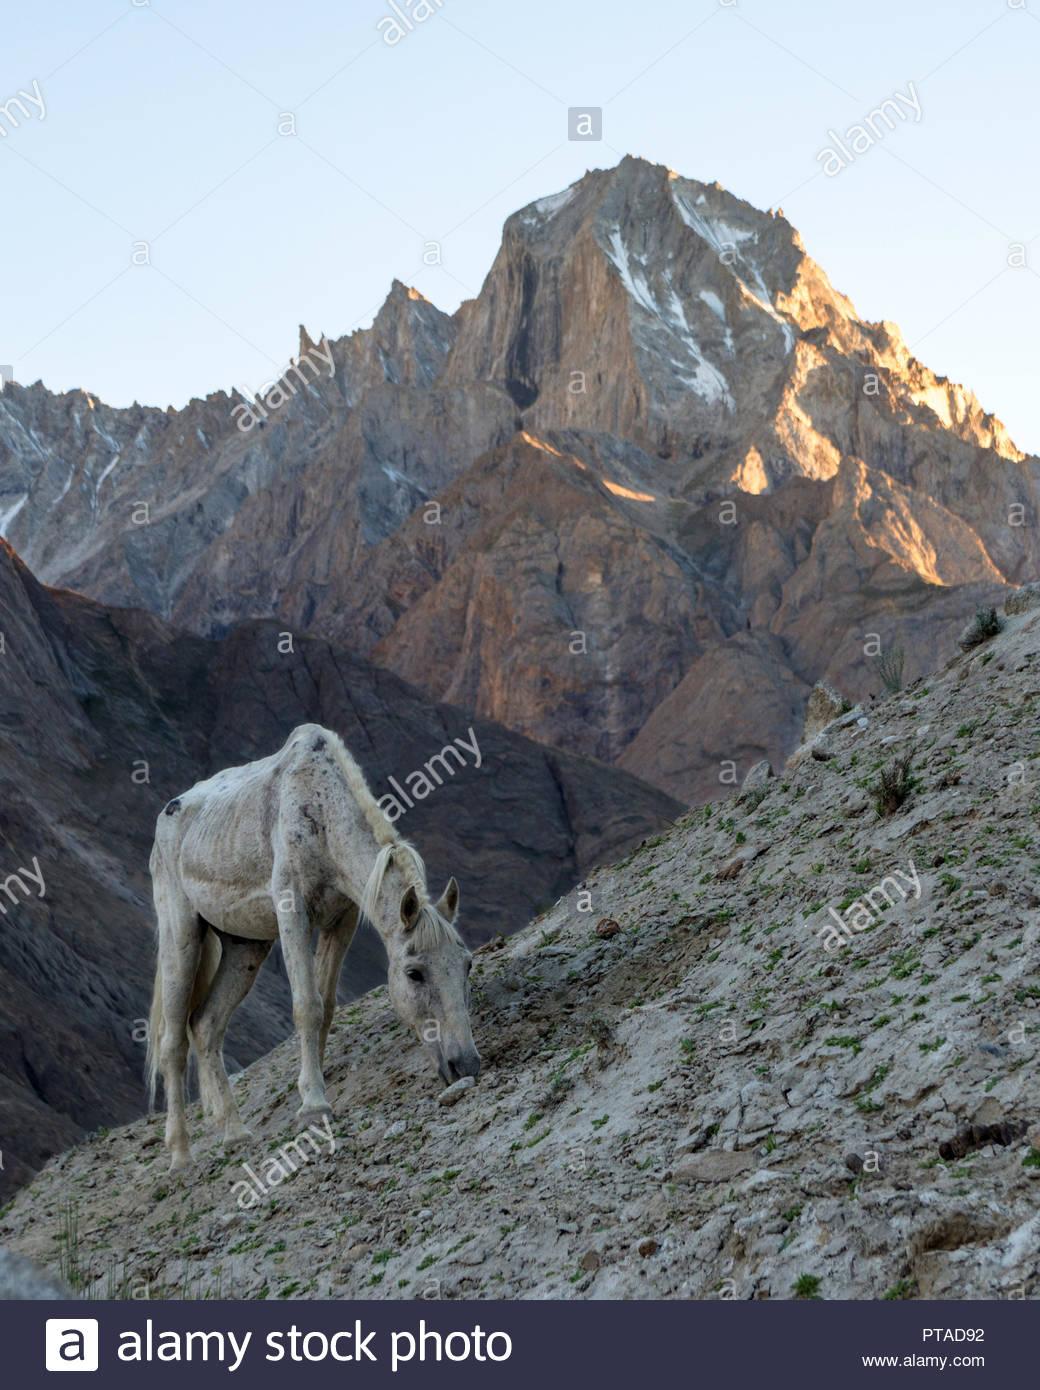 White horse grazing on the slopes near Payu campsite, Karakoram, Pakistan - Stock Image